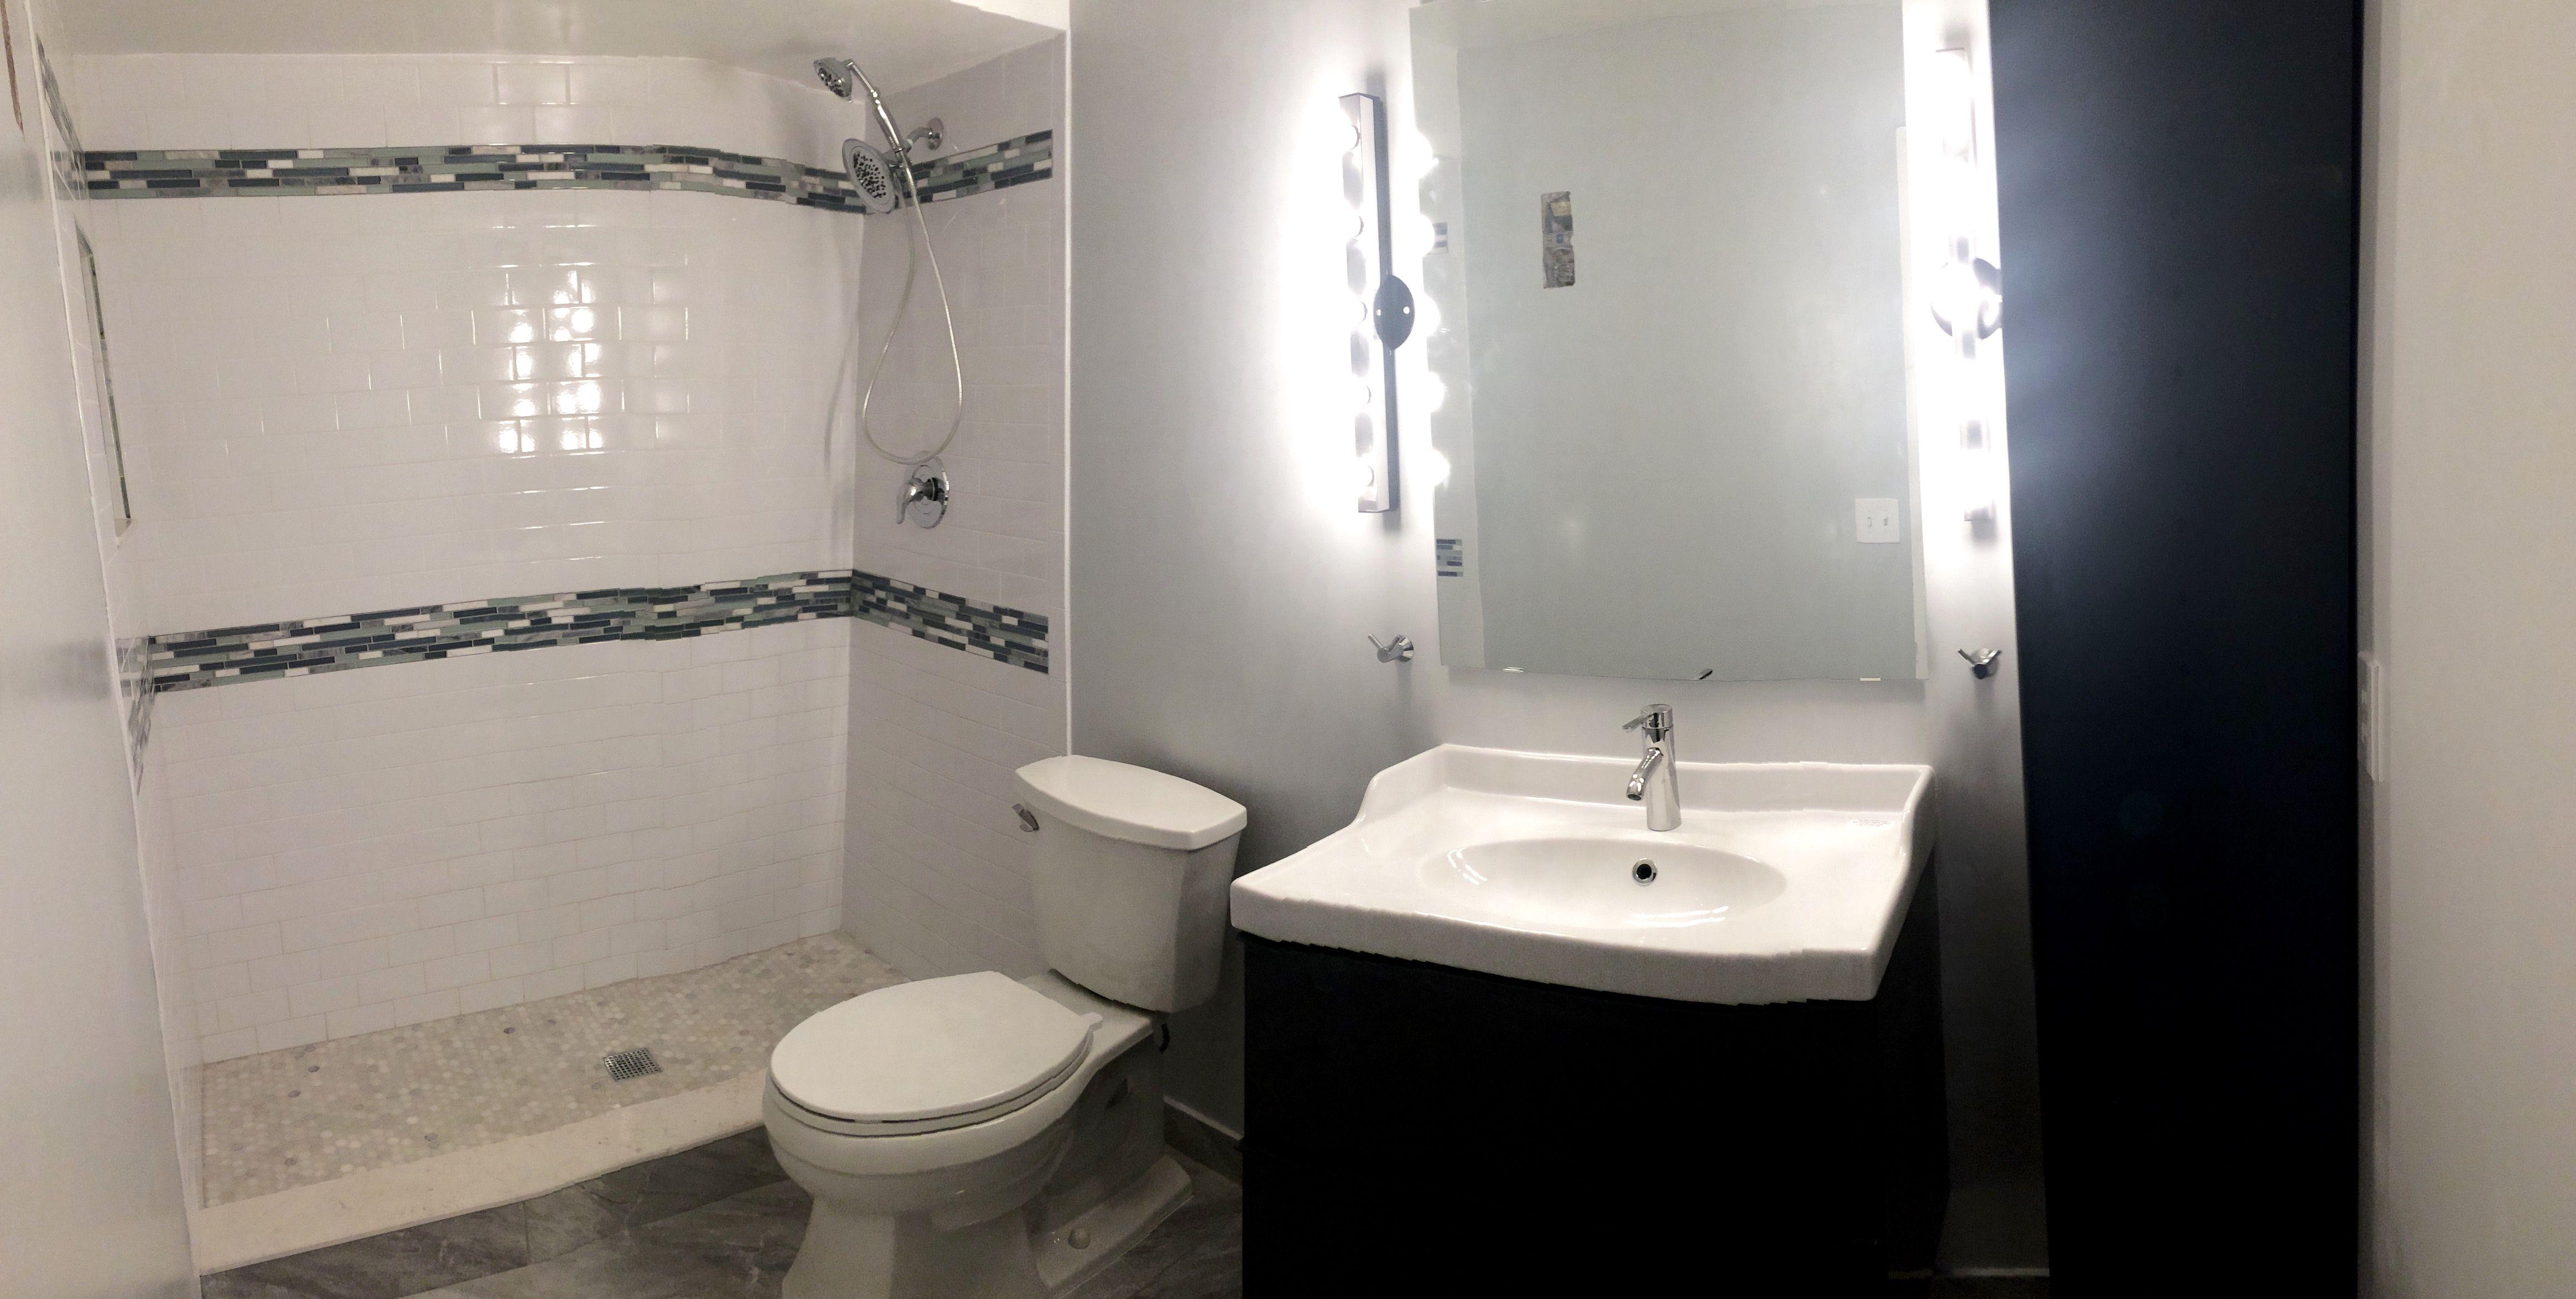 IKEA Godmorgon Bathroom Master Bathroom White Subway Tile Shower Marble  Carrera Hexagon Mosaic Blue And Gray Glass And Stone Mosaic Ikea Bathroom  Grey And ...